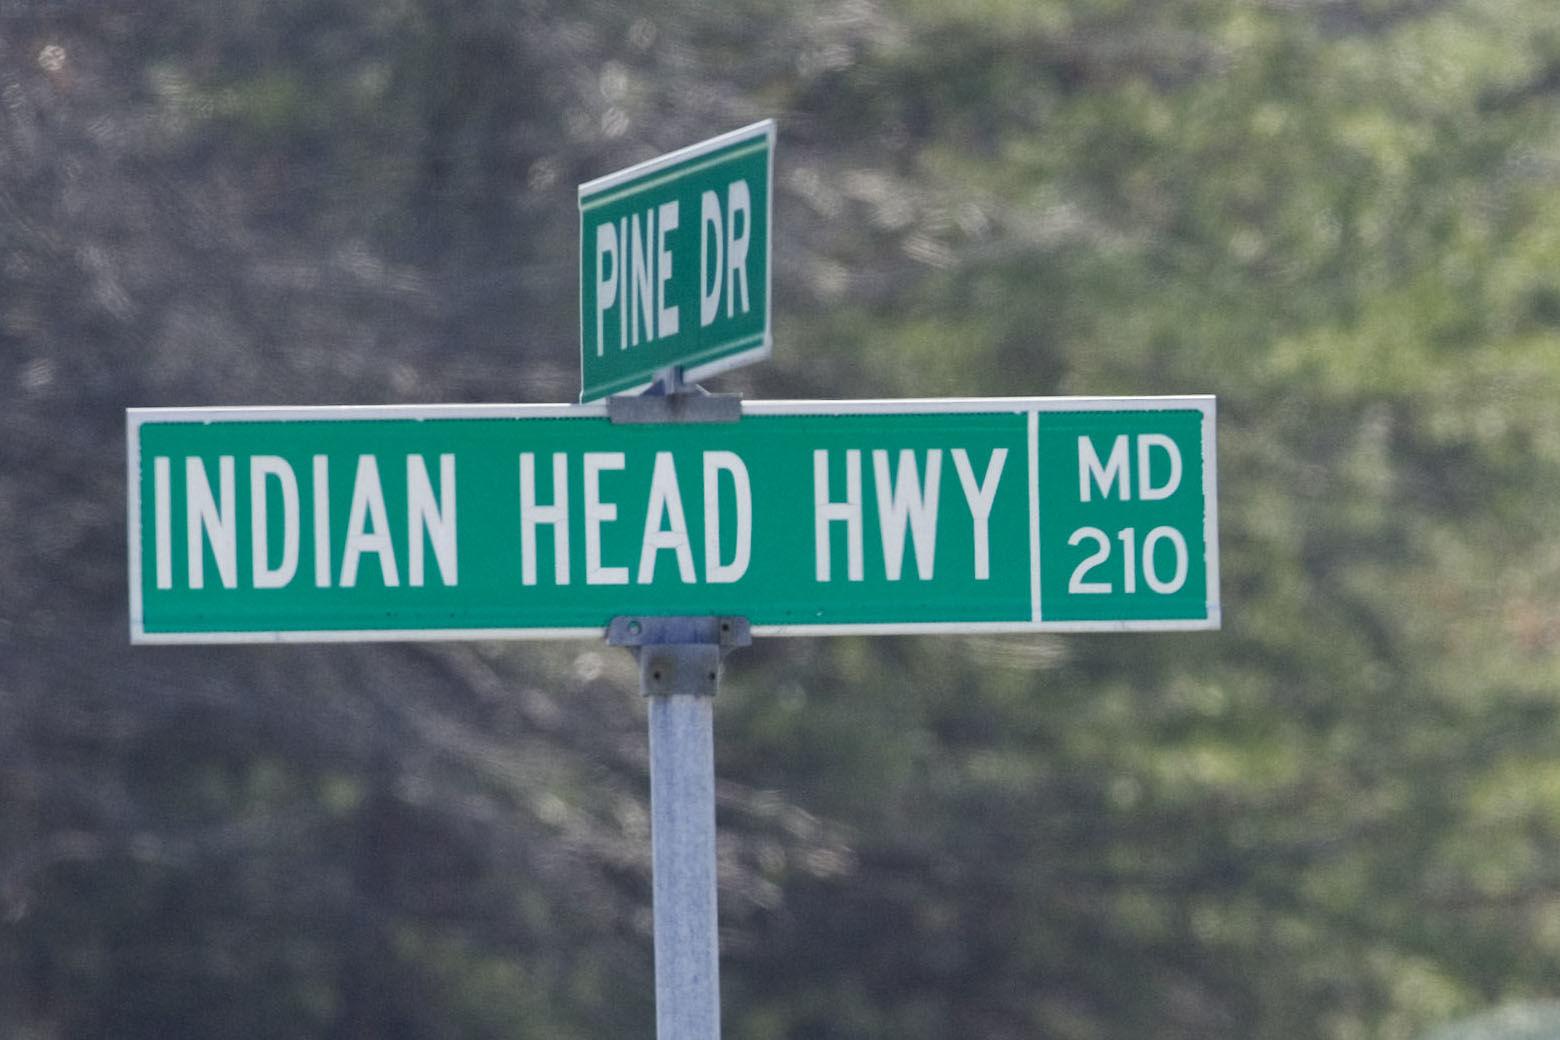 FILE — Emergency personnel investigate a car crash on Indian Head Highway, Saturday, Feb. 16, 2008. (AP Photo/Haraz N. Ghanbari)